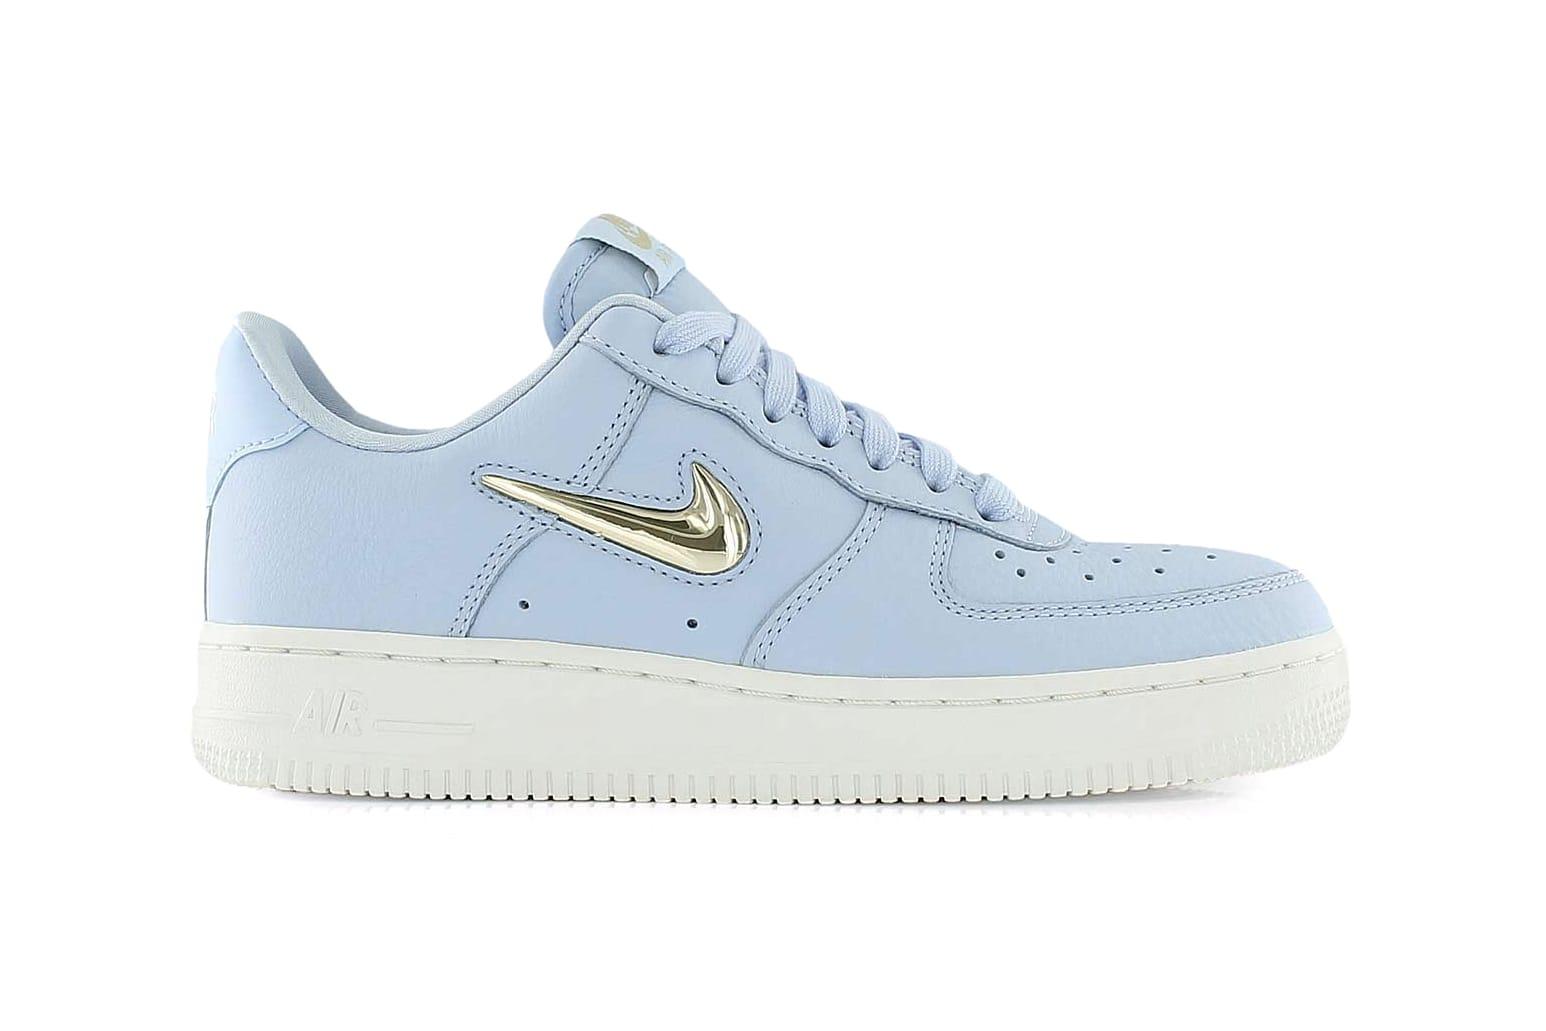 Nike Air Force 1 Premium LX Royal Tint